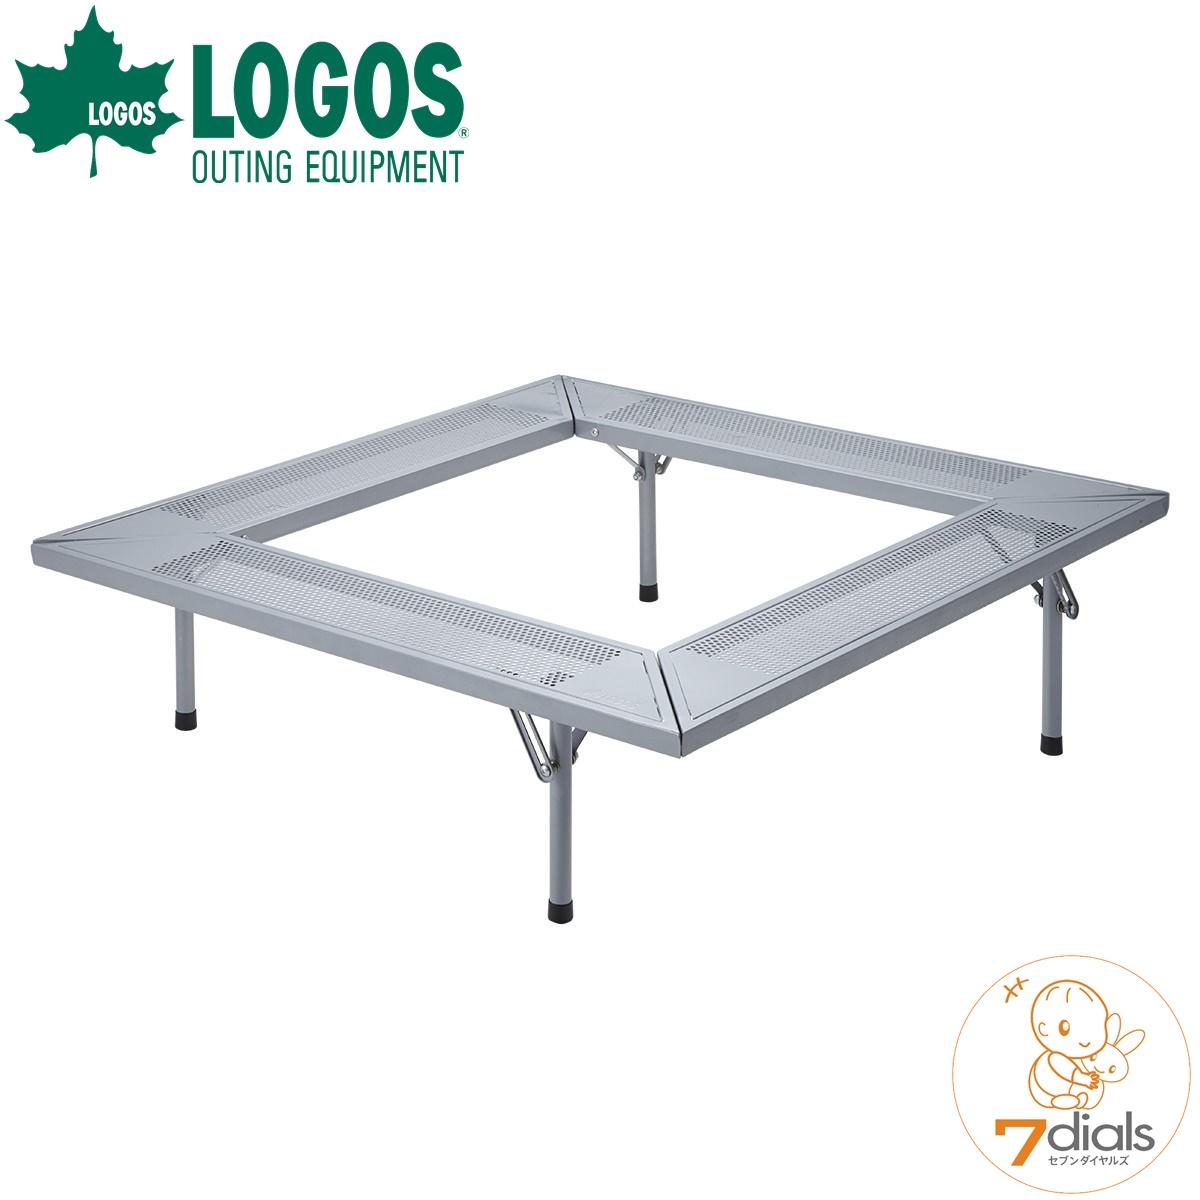 LOGOS/ロゴス 囲炉裏テーブルLIGHT-XL ロゴスの焚火ピラミッドグリルXLがちょうど設置できる囲炉裏テーブル コンパクト収納 テーブルはコップやお皿なども置けるので便利【送料無料】